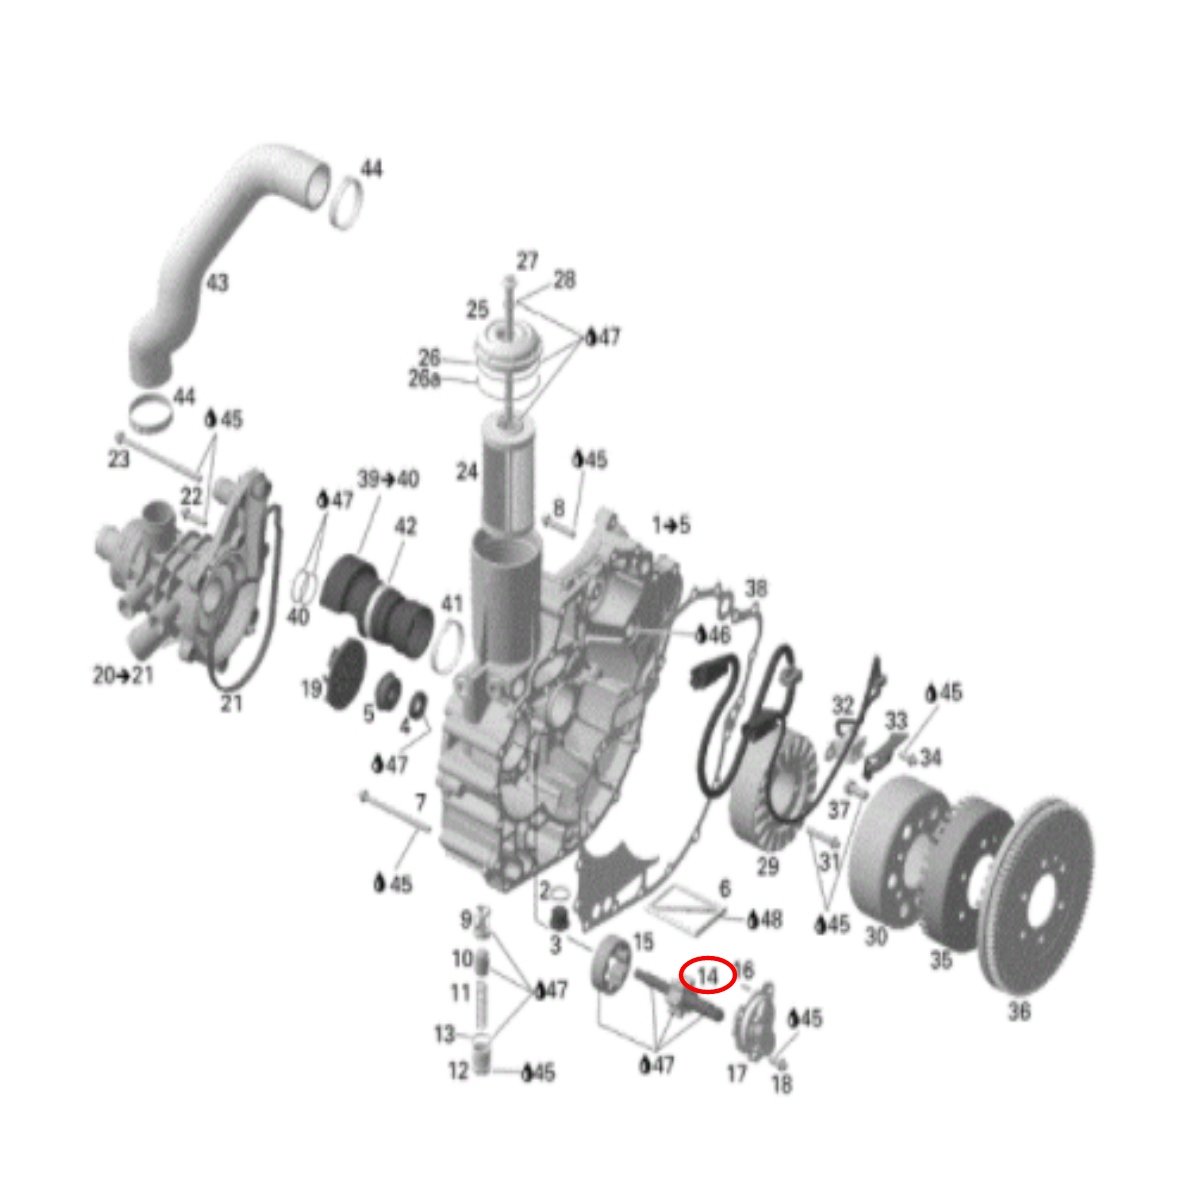 Eixo Bomba Óleo para Jet Ski Sea Doo RXP/GTI/GTX IS LD MAG  - Radical Peças - Peças para Jet Ski